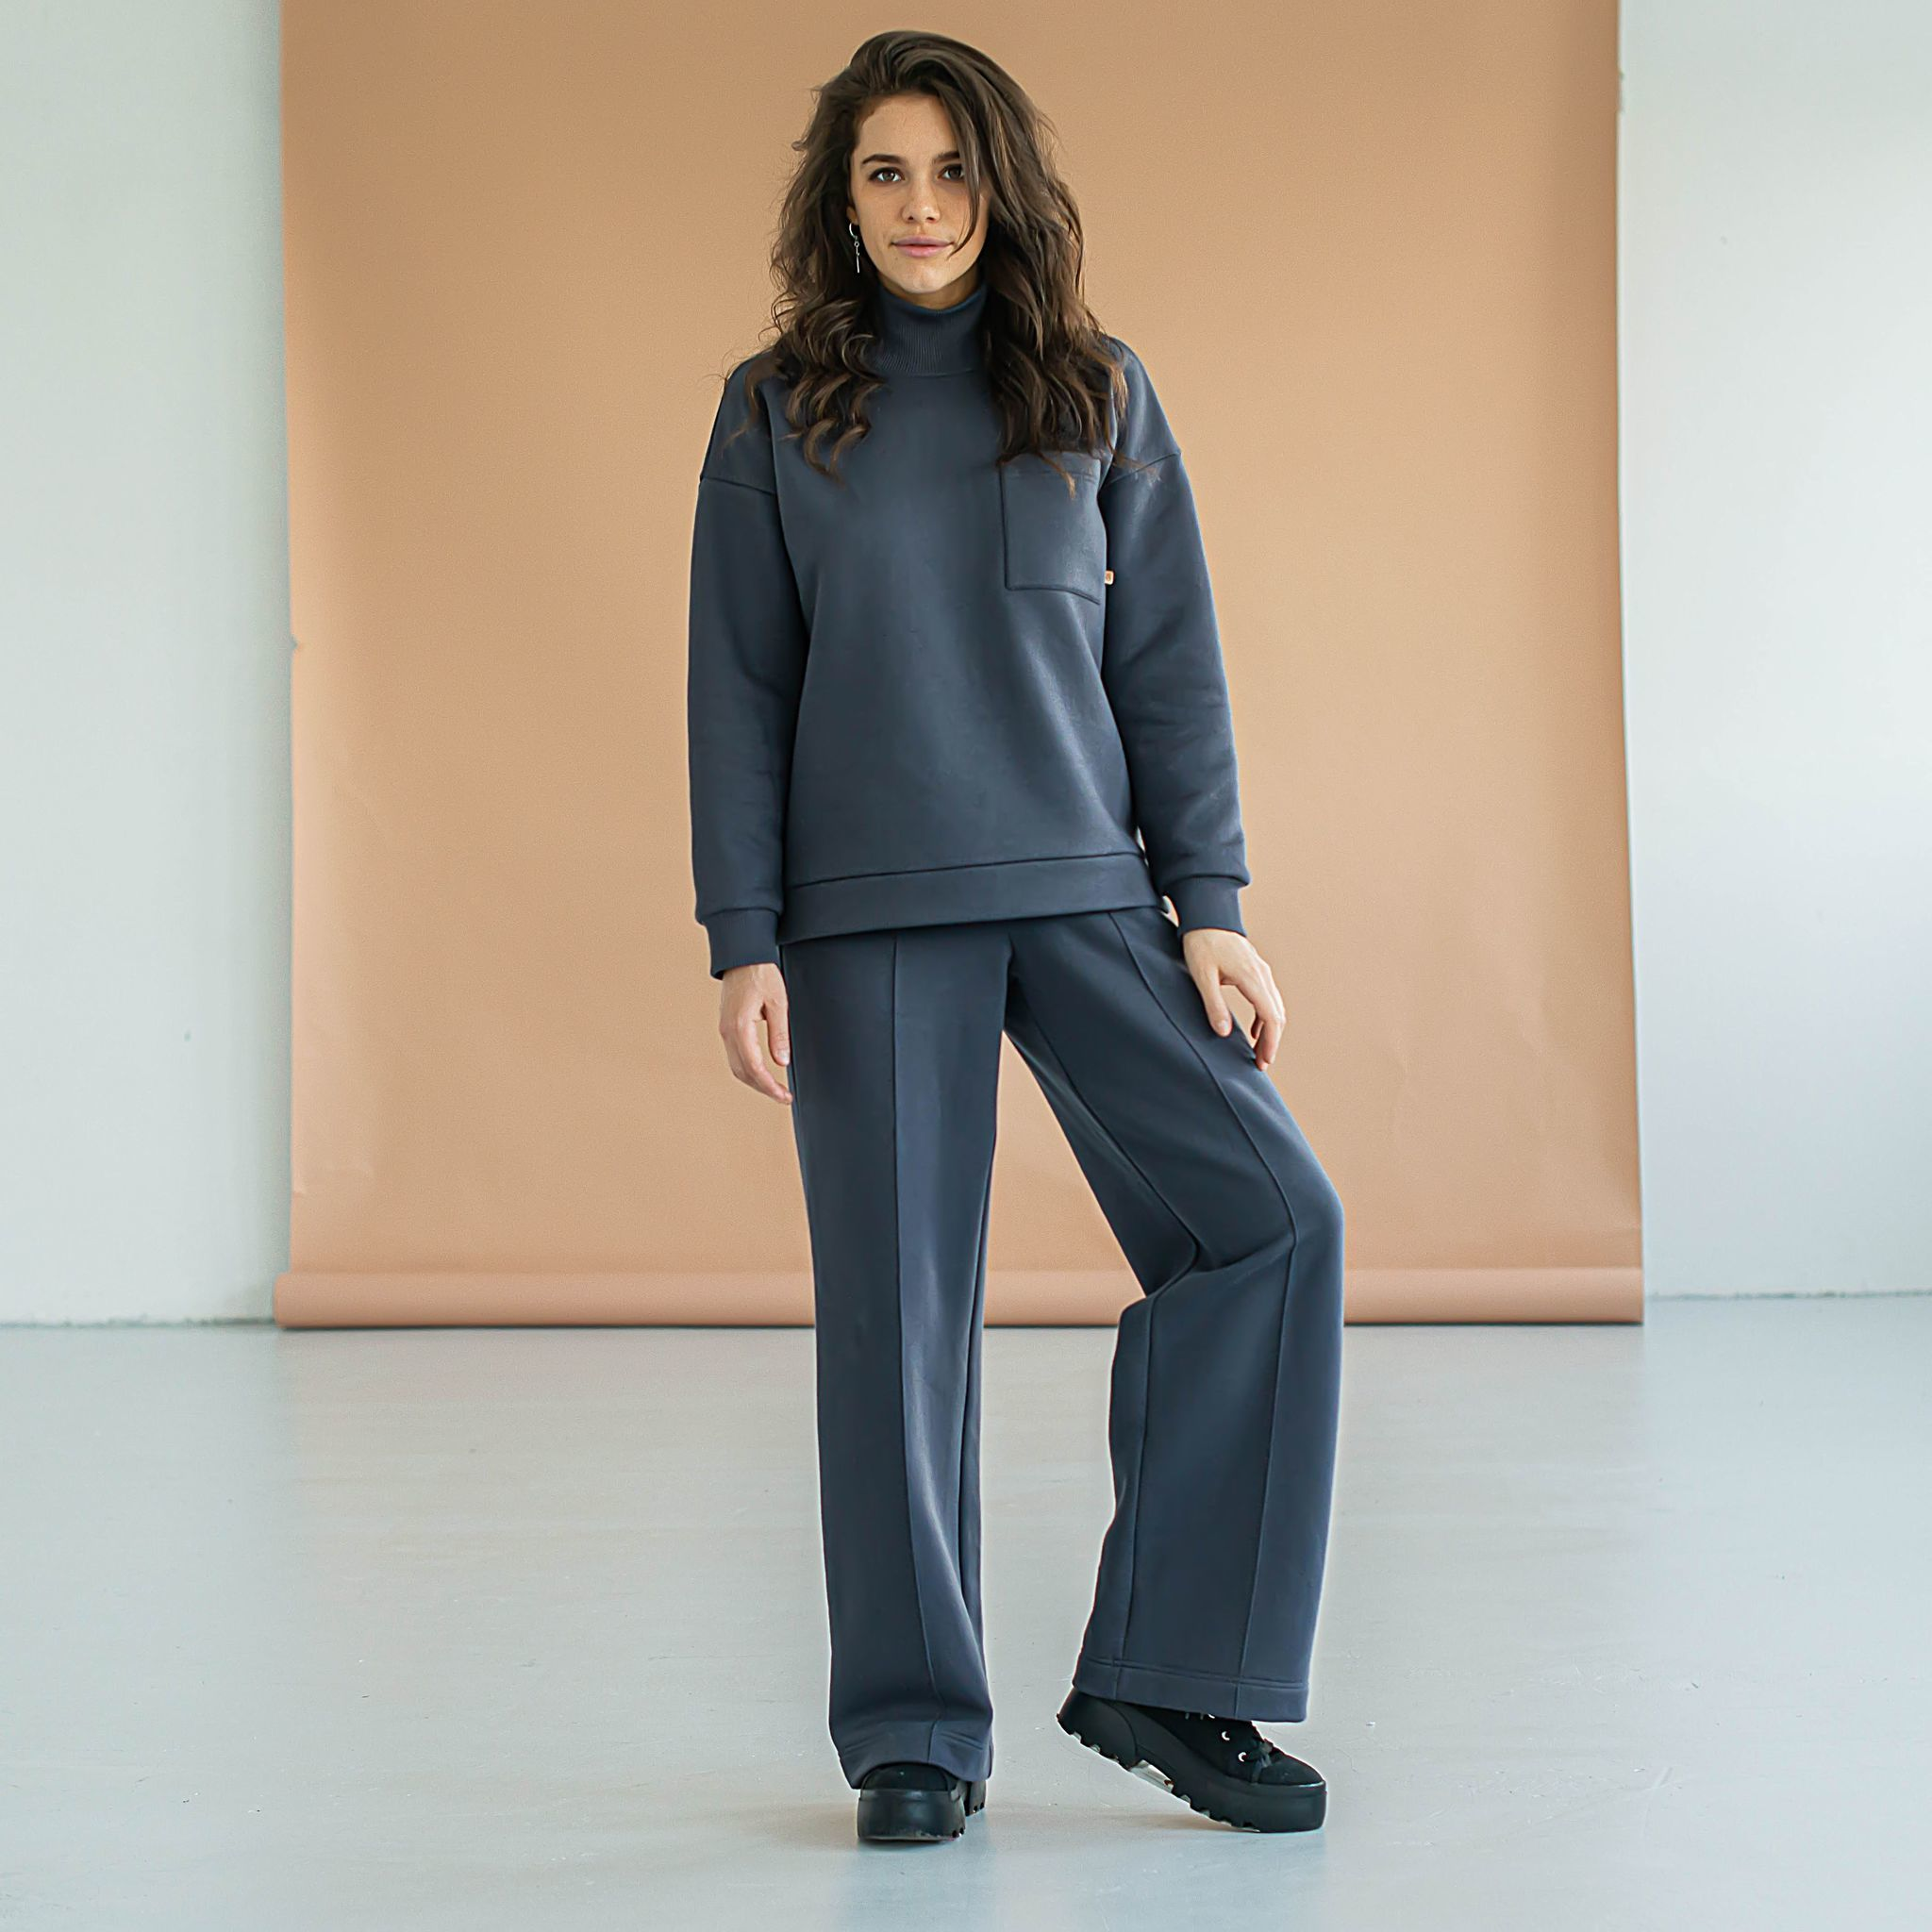 Warm oversized sweatsuit for women - Graphite